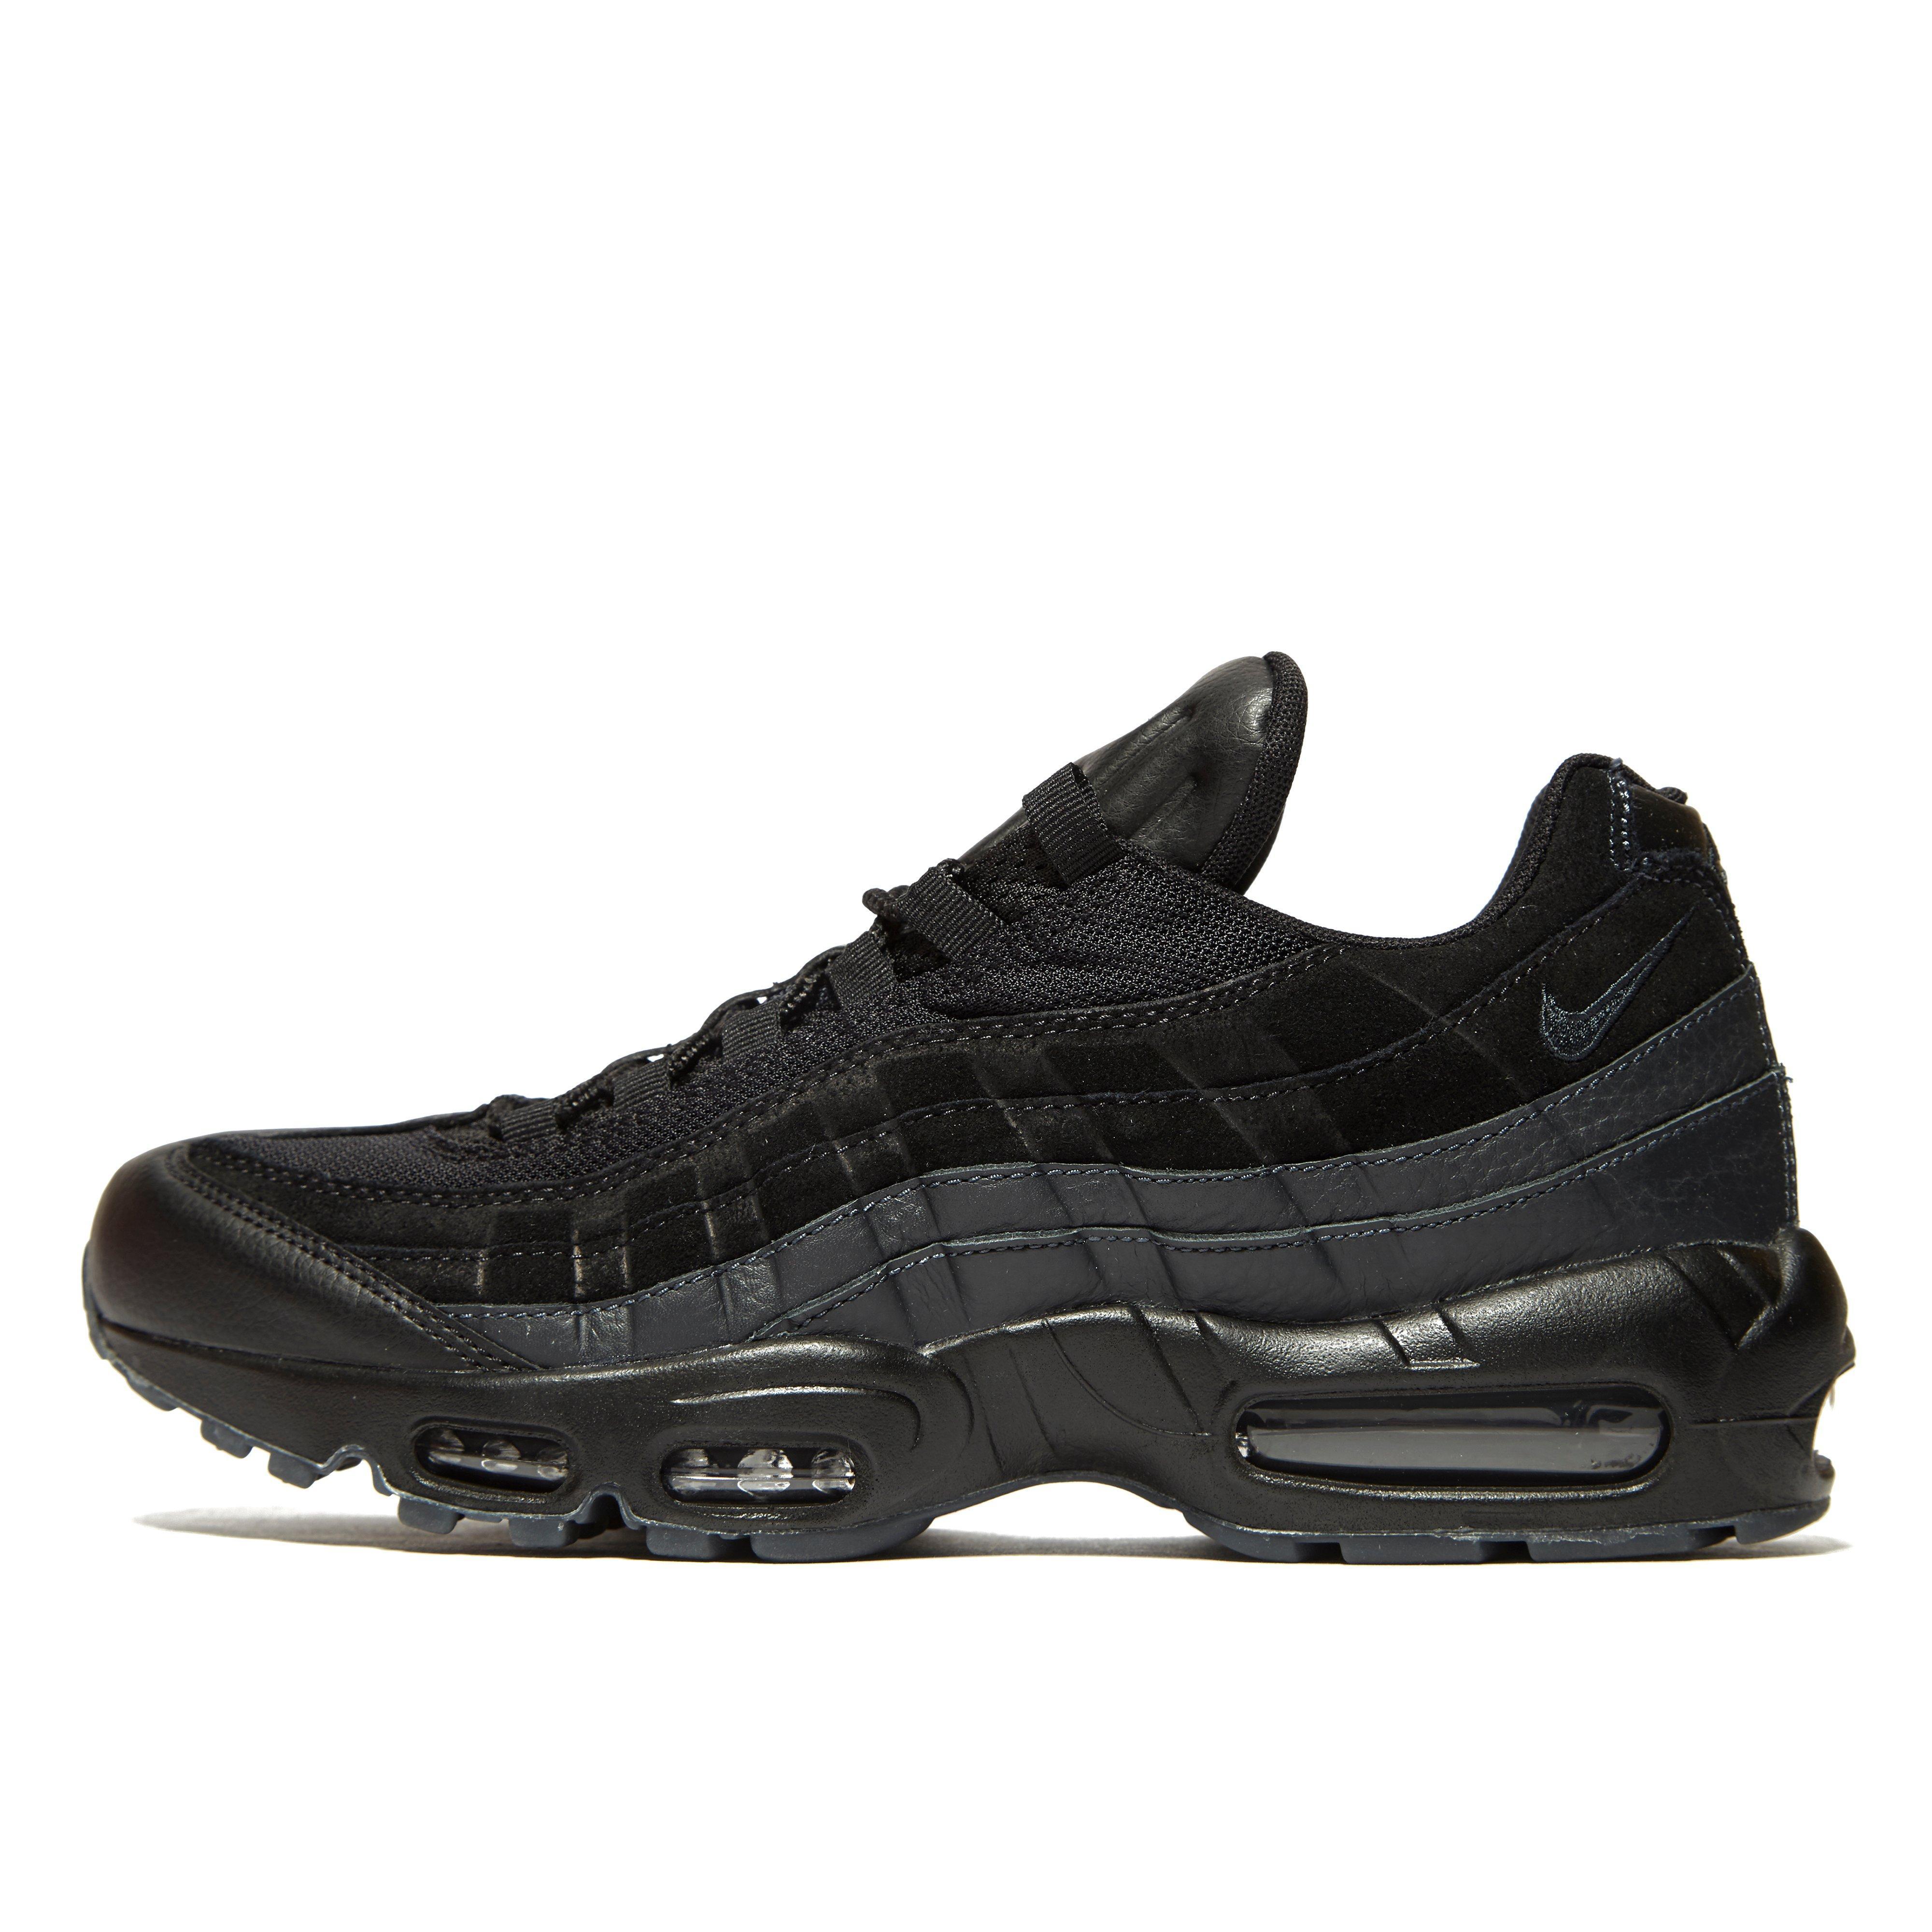 Hommes Nike Air Max 95 Vente Voitures Royaume-uni rabais réel vente wiki MY4Yy0y